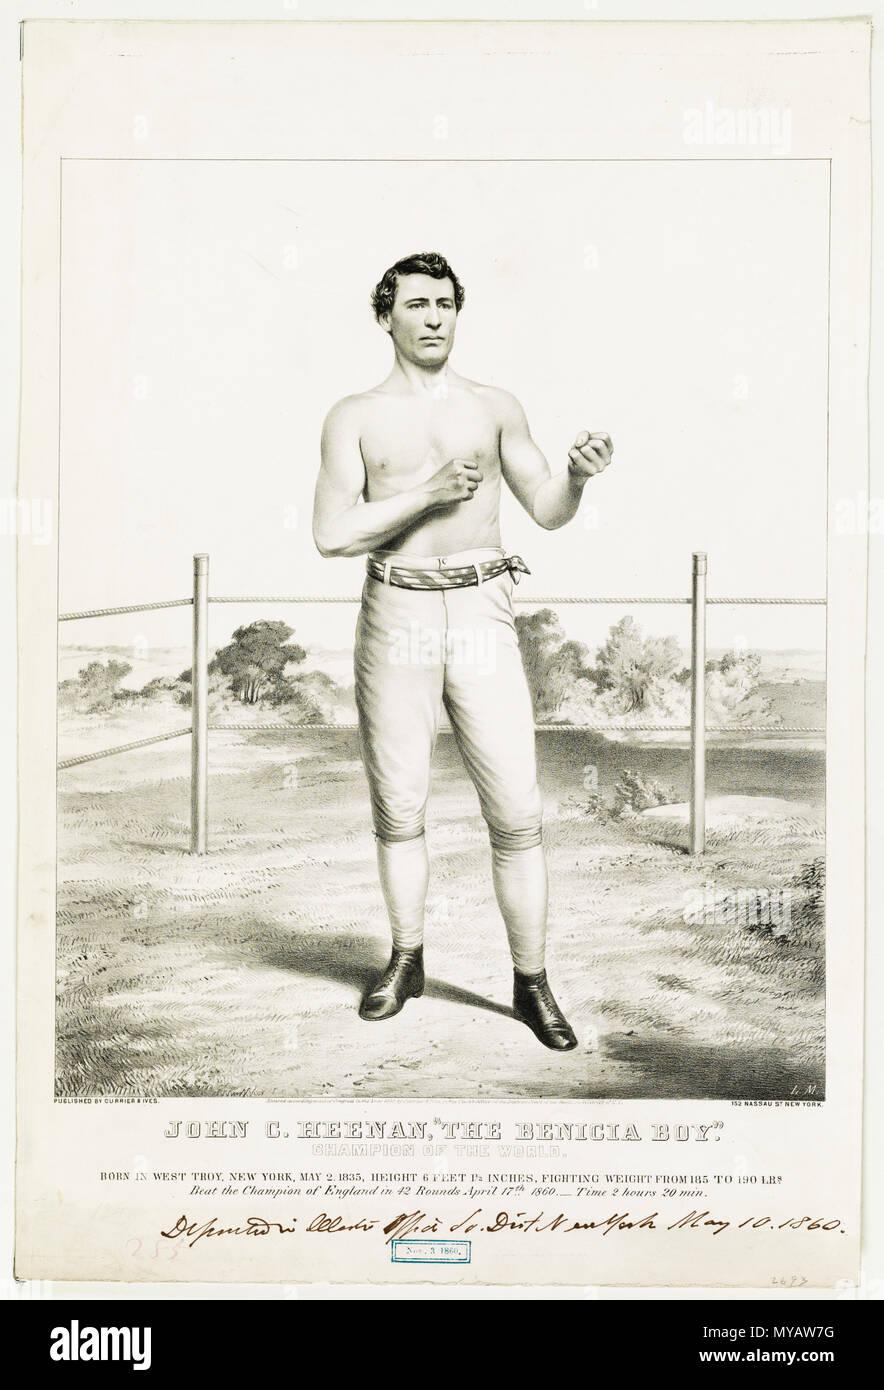 John C. Heenan, The Benicia Boy - champion of the world c 1860 - Stock Image